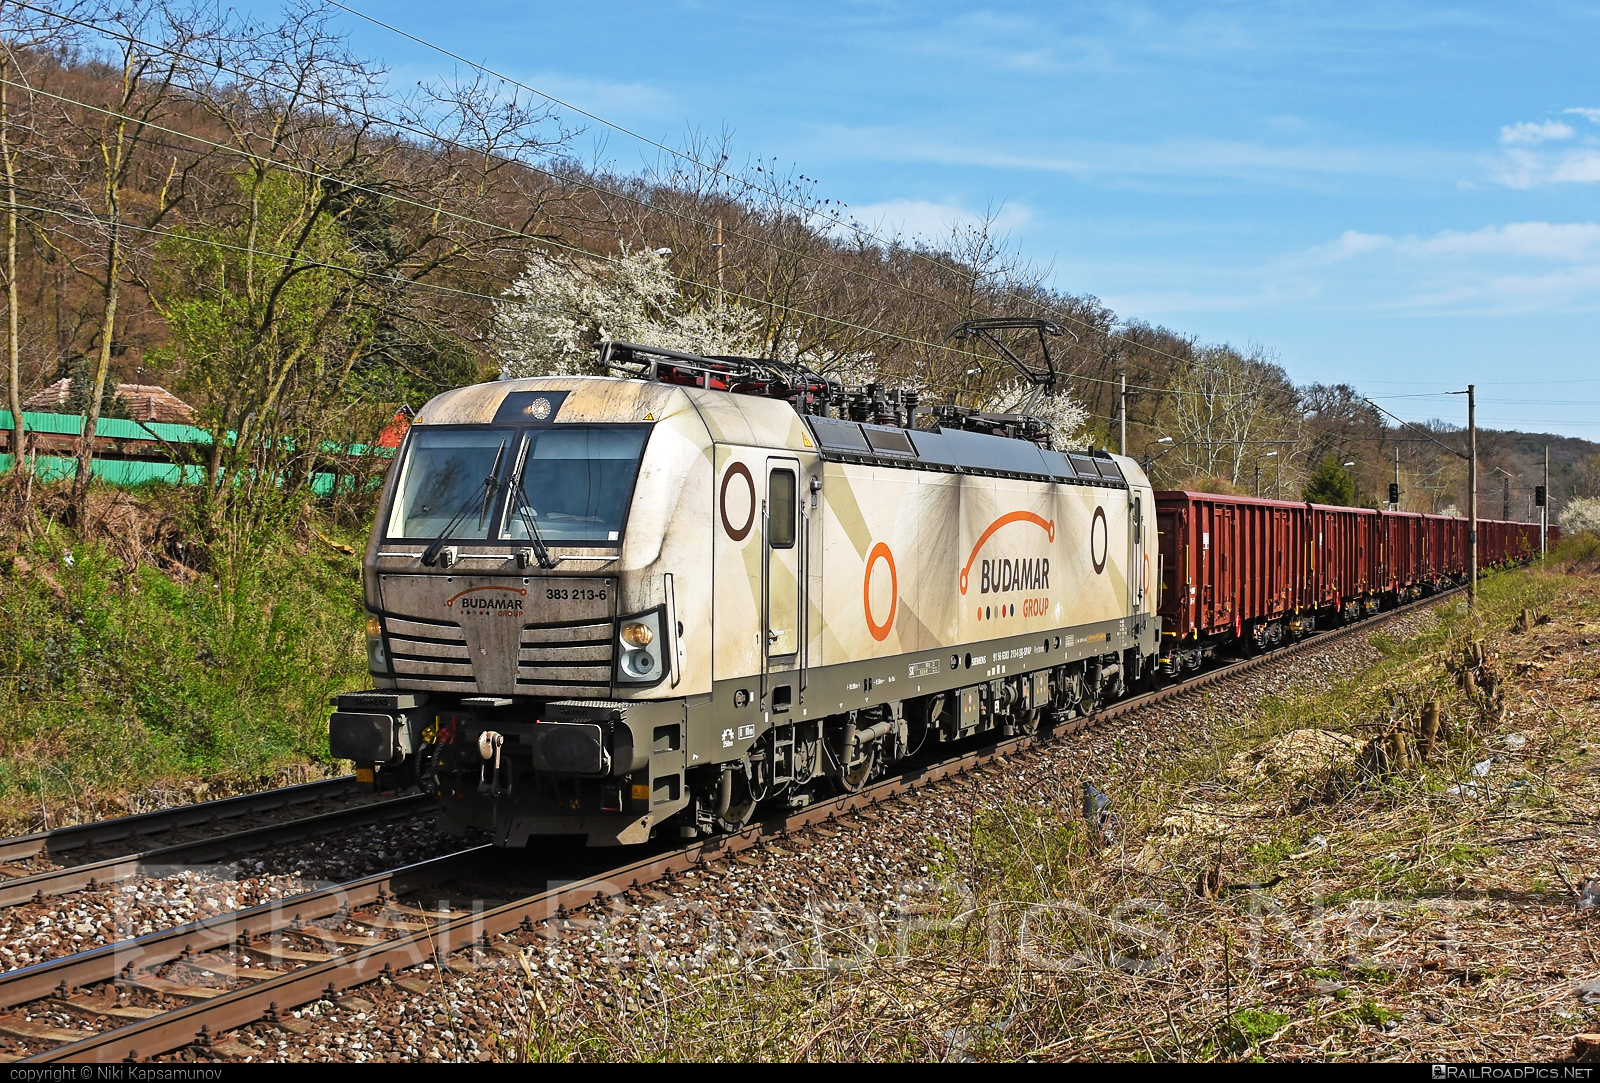 Siemens Vectron MS - 383 213-6 operated by LOKORAIL, a.s. #budamar #lokorail #lrl #siemens #siemensvectron #siemensvectronms #slovenskaplavbaapristavy #slovenskaplavbaapristavyas #spap #vectron #vectronms